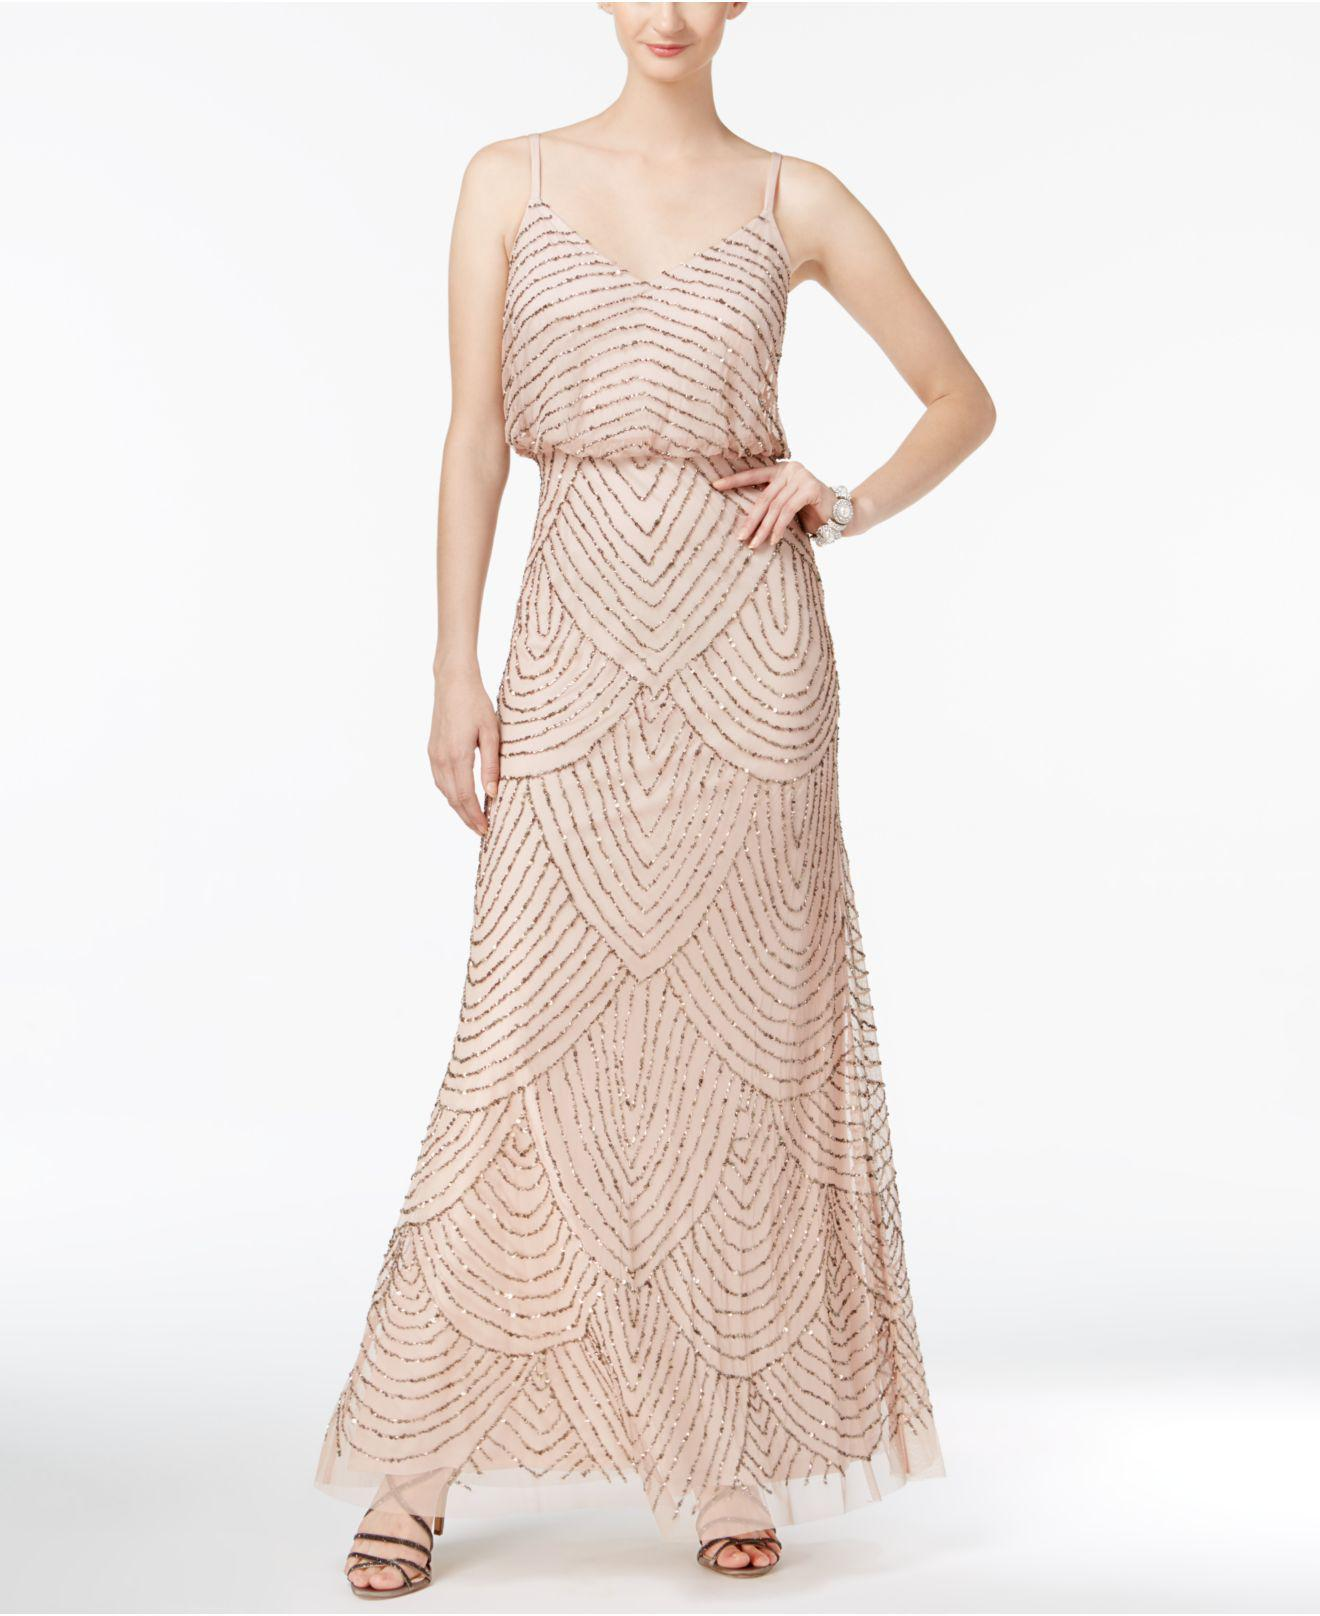 Lyst Adrianna Papell Spaghetti Strap Beaded Blouson Gown